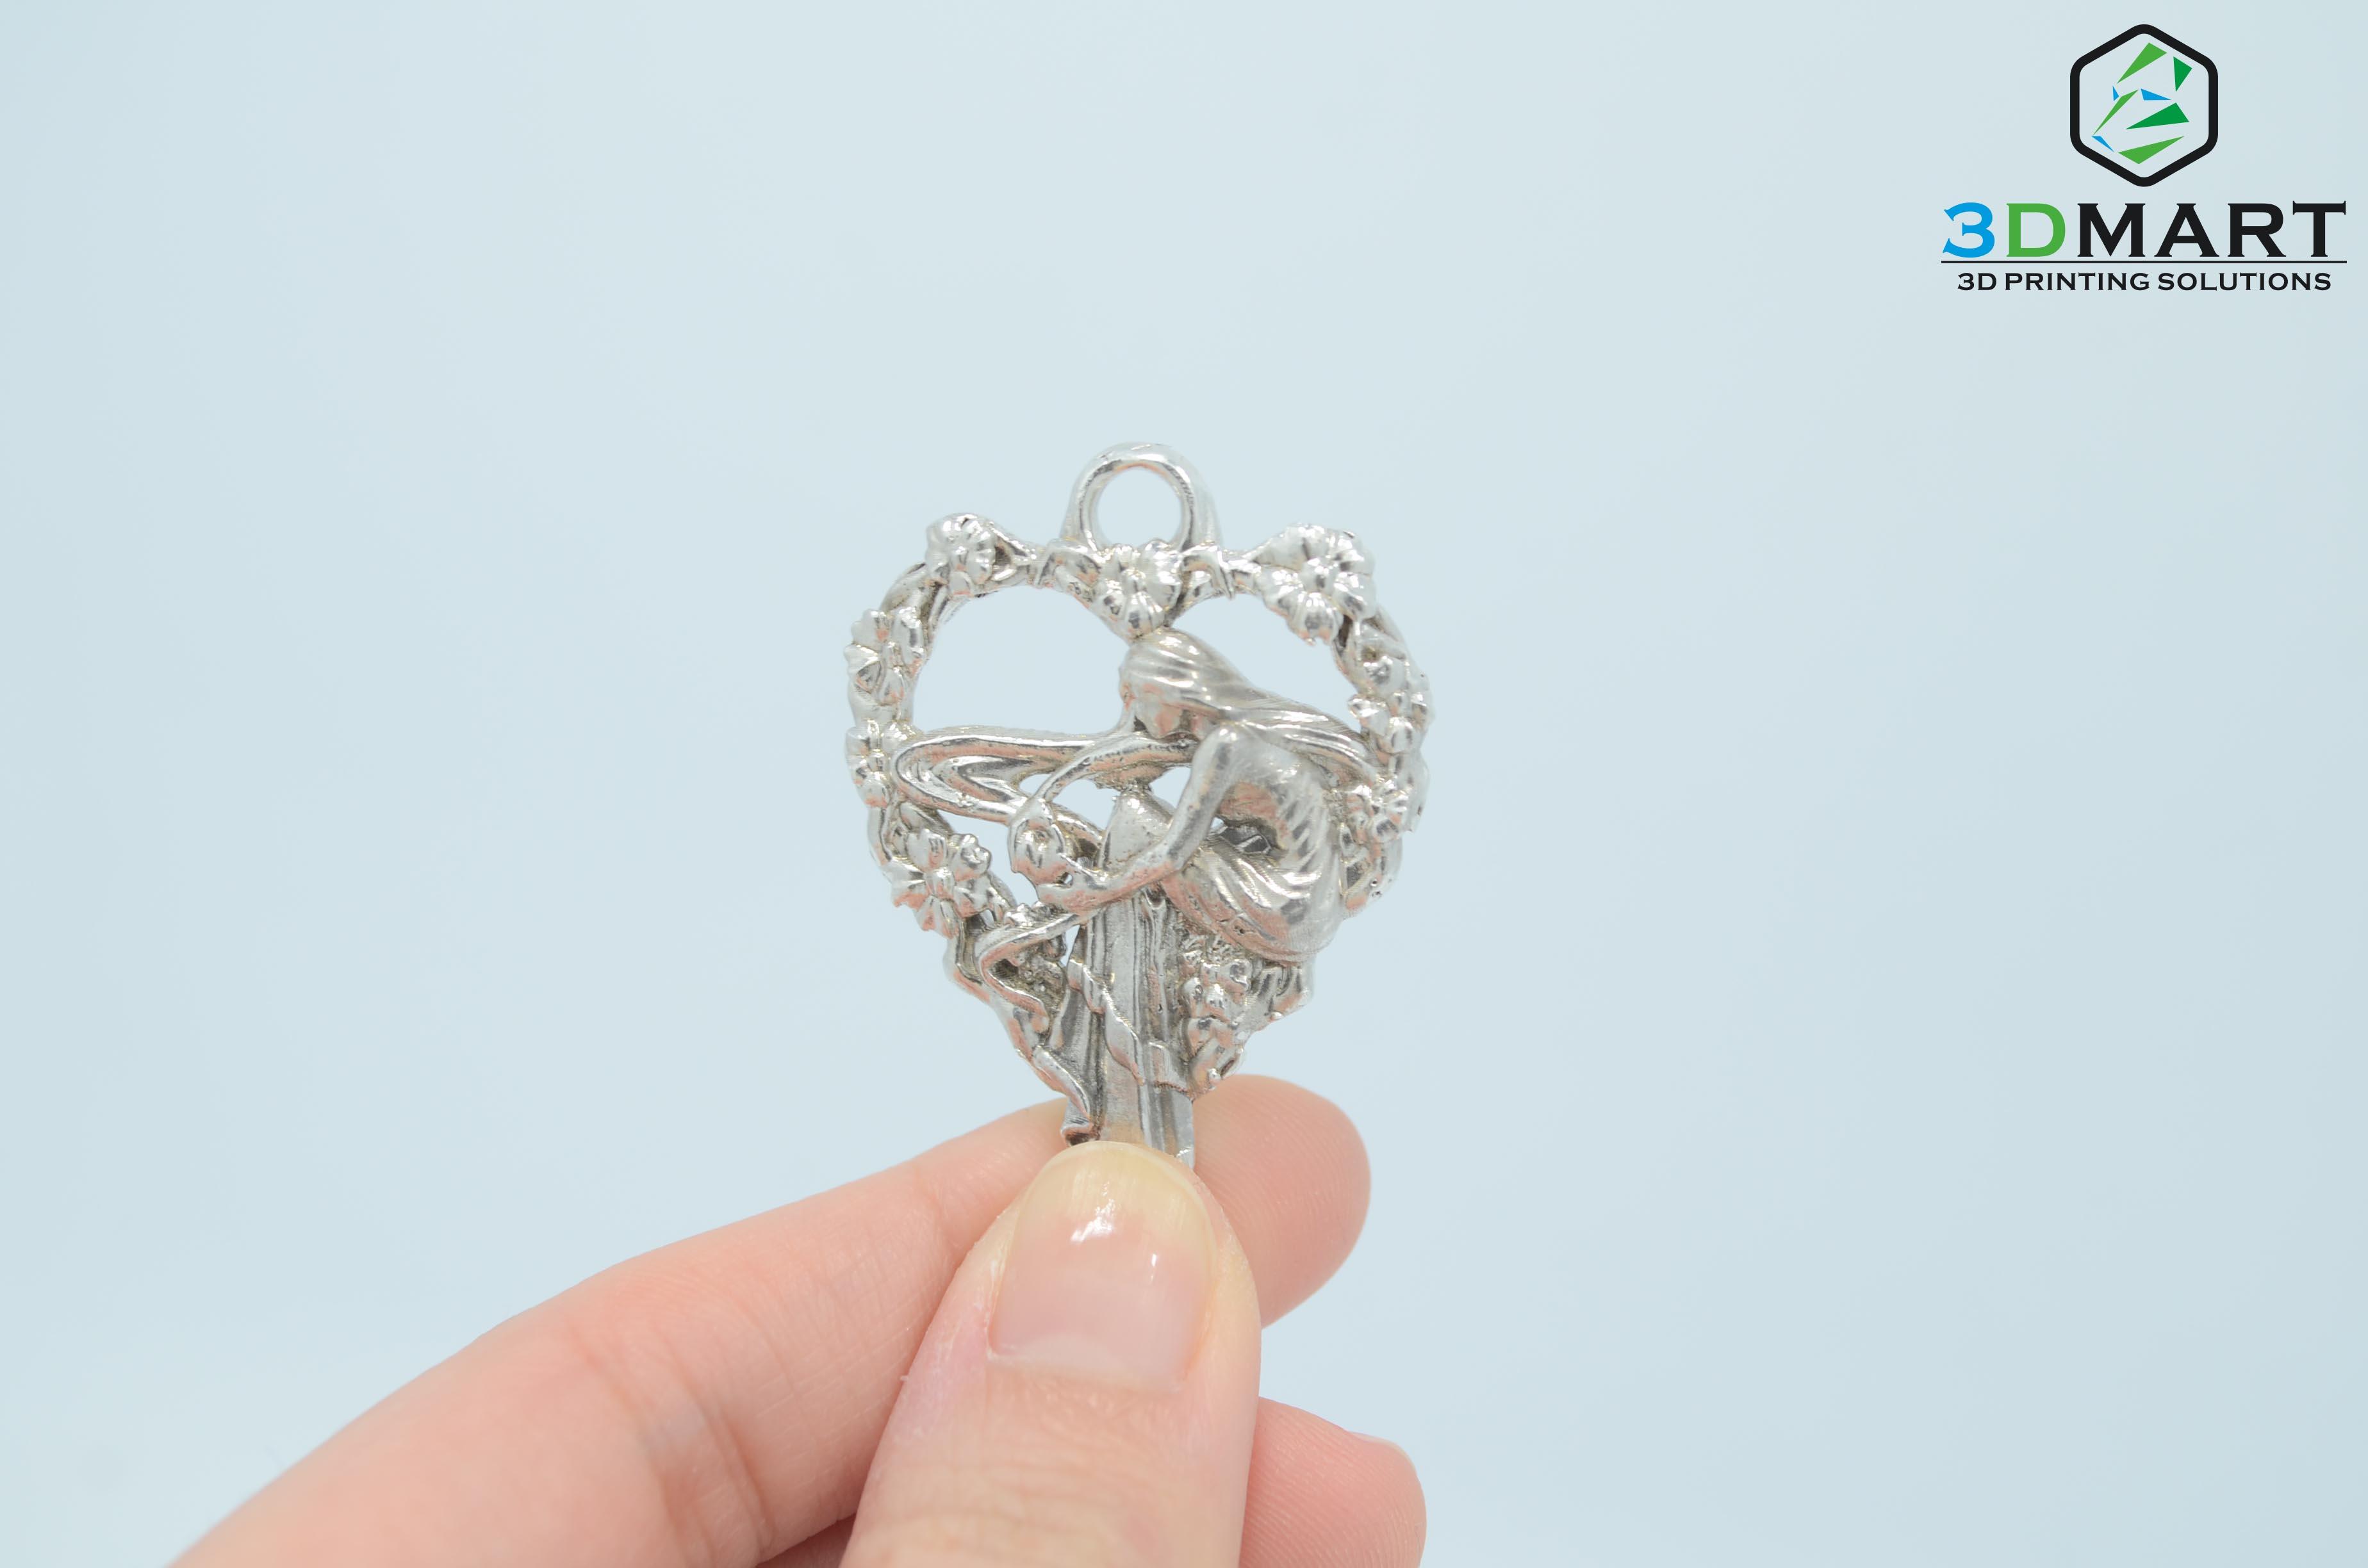 DWS XFAB SLA光固化3D列印機 鑄造樹脂